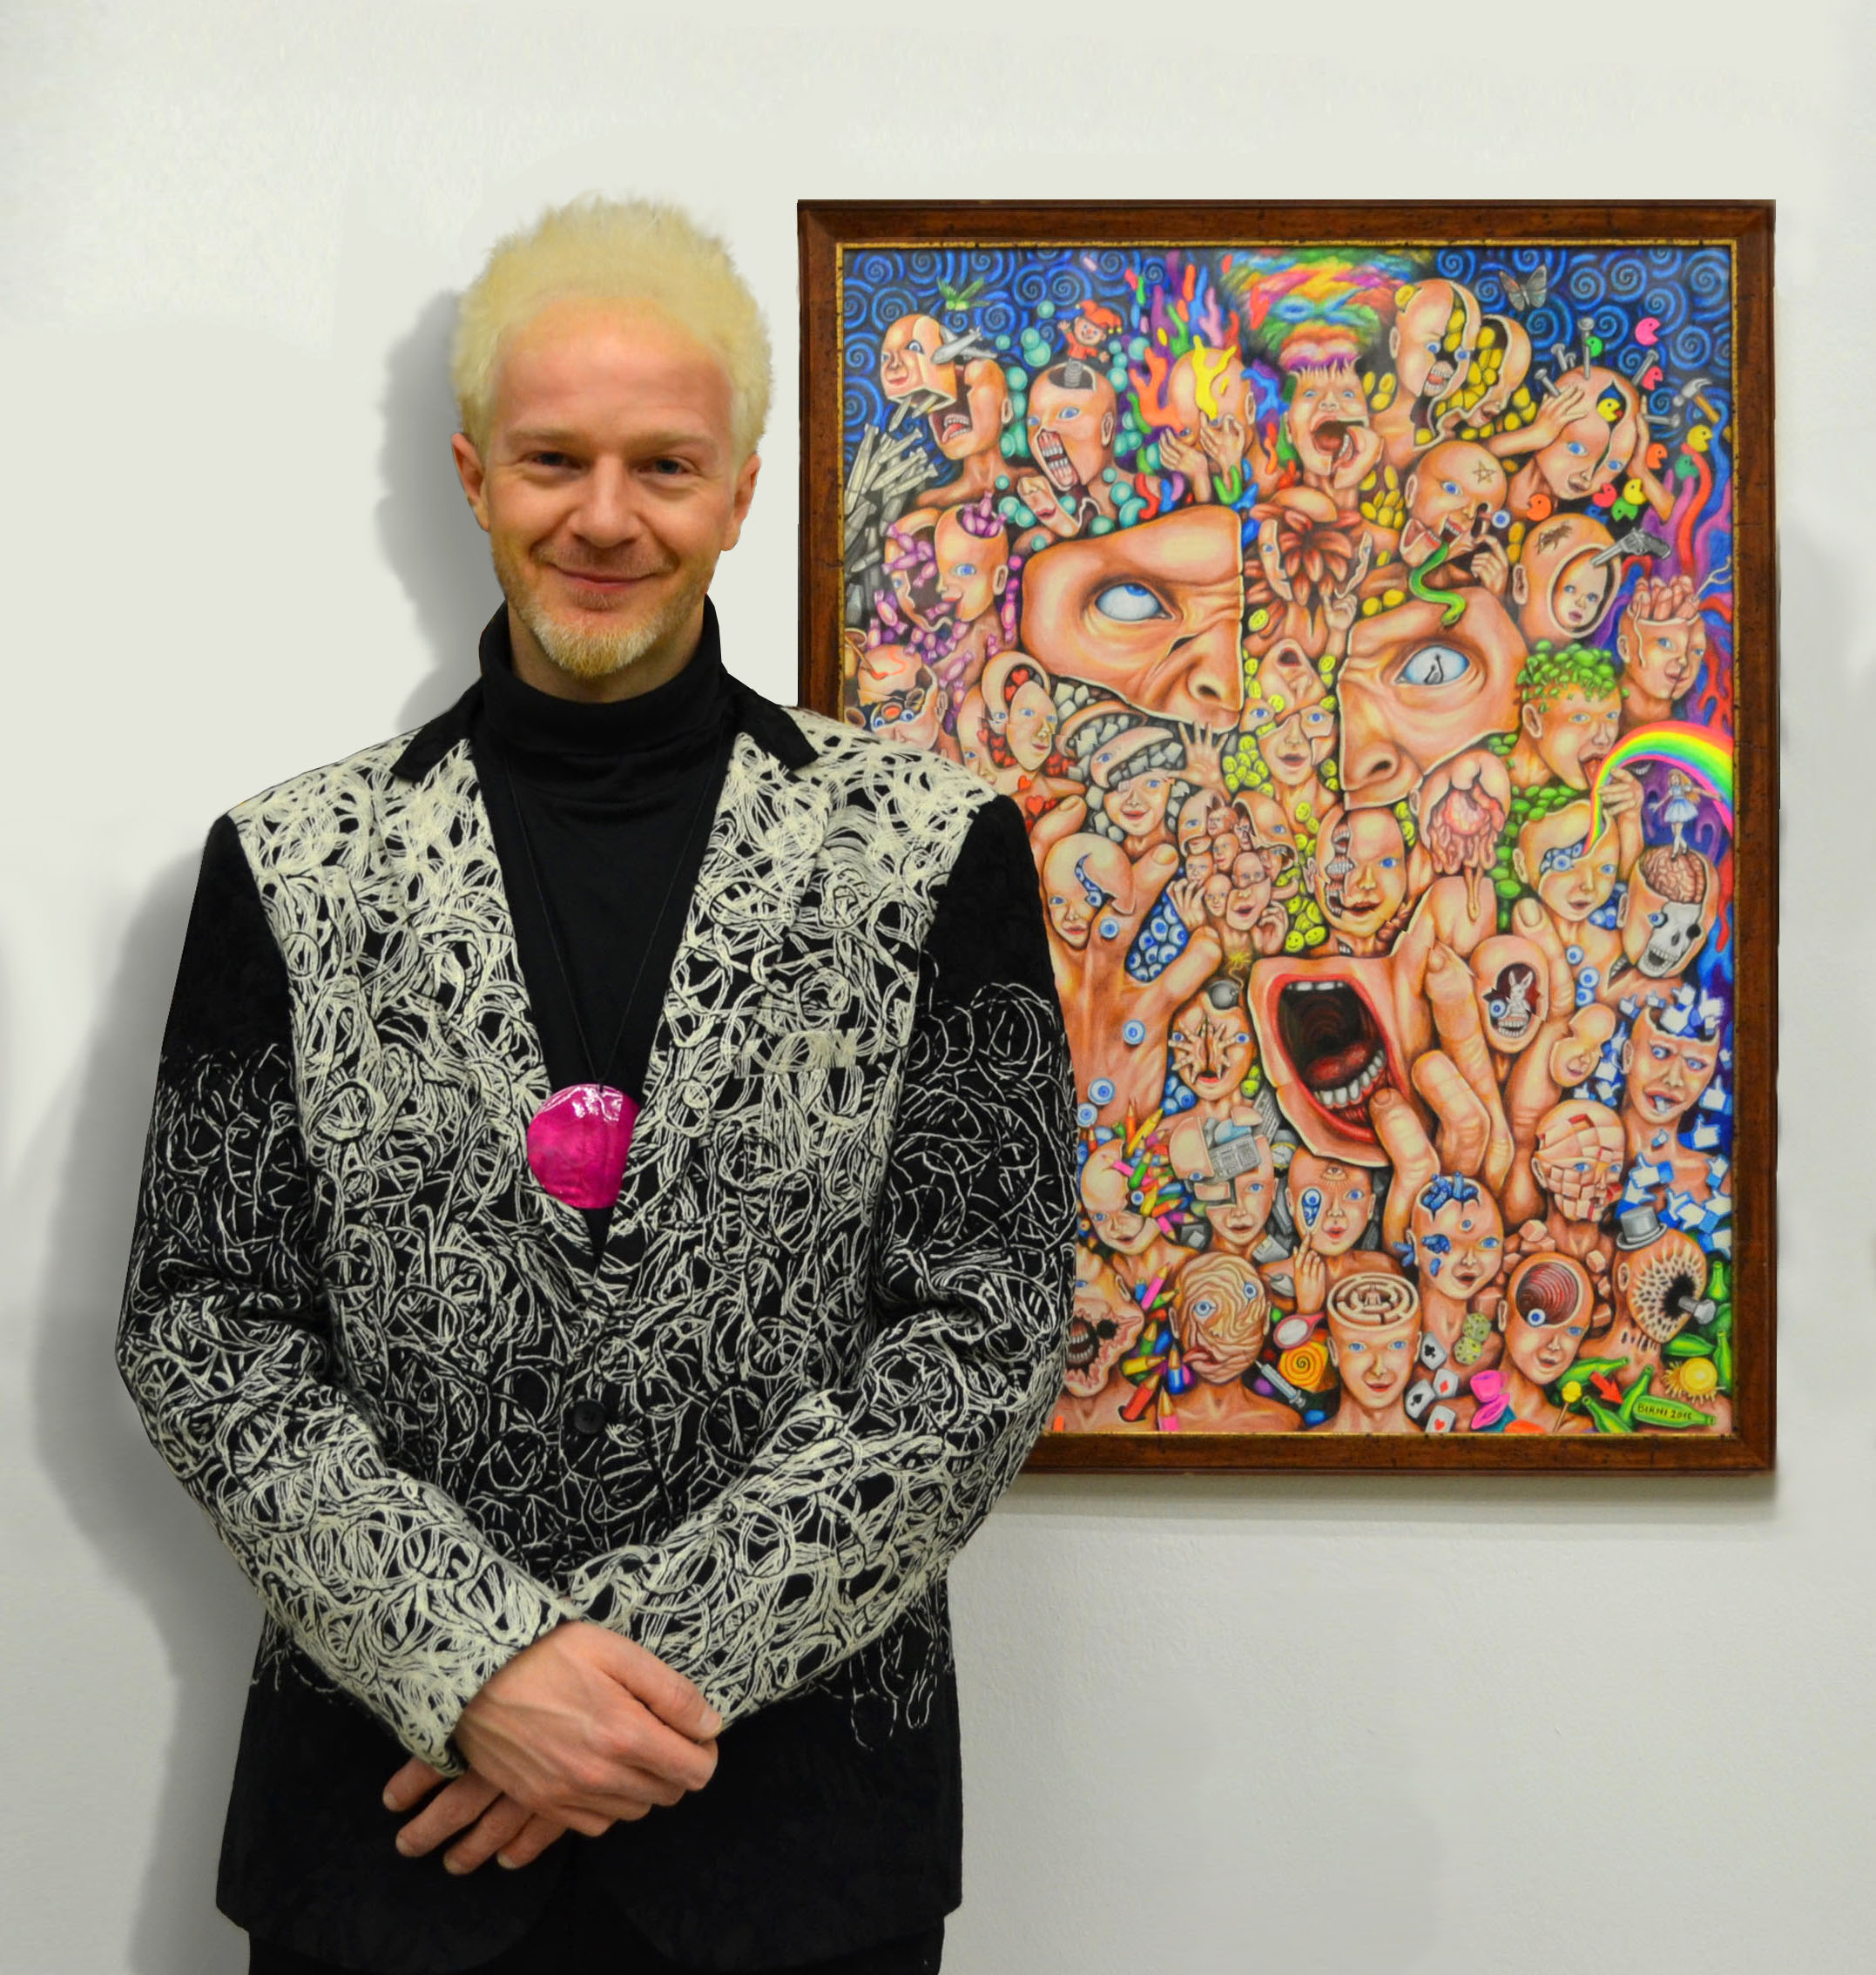 Michael Birnstingl